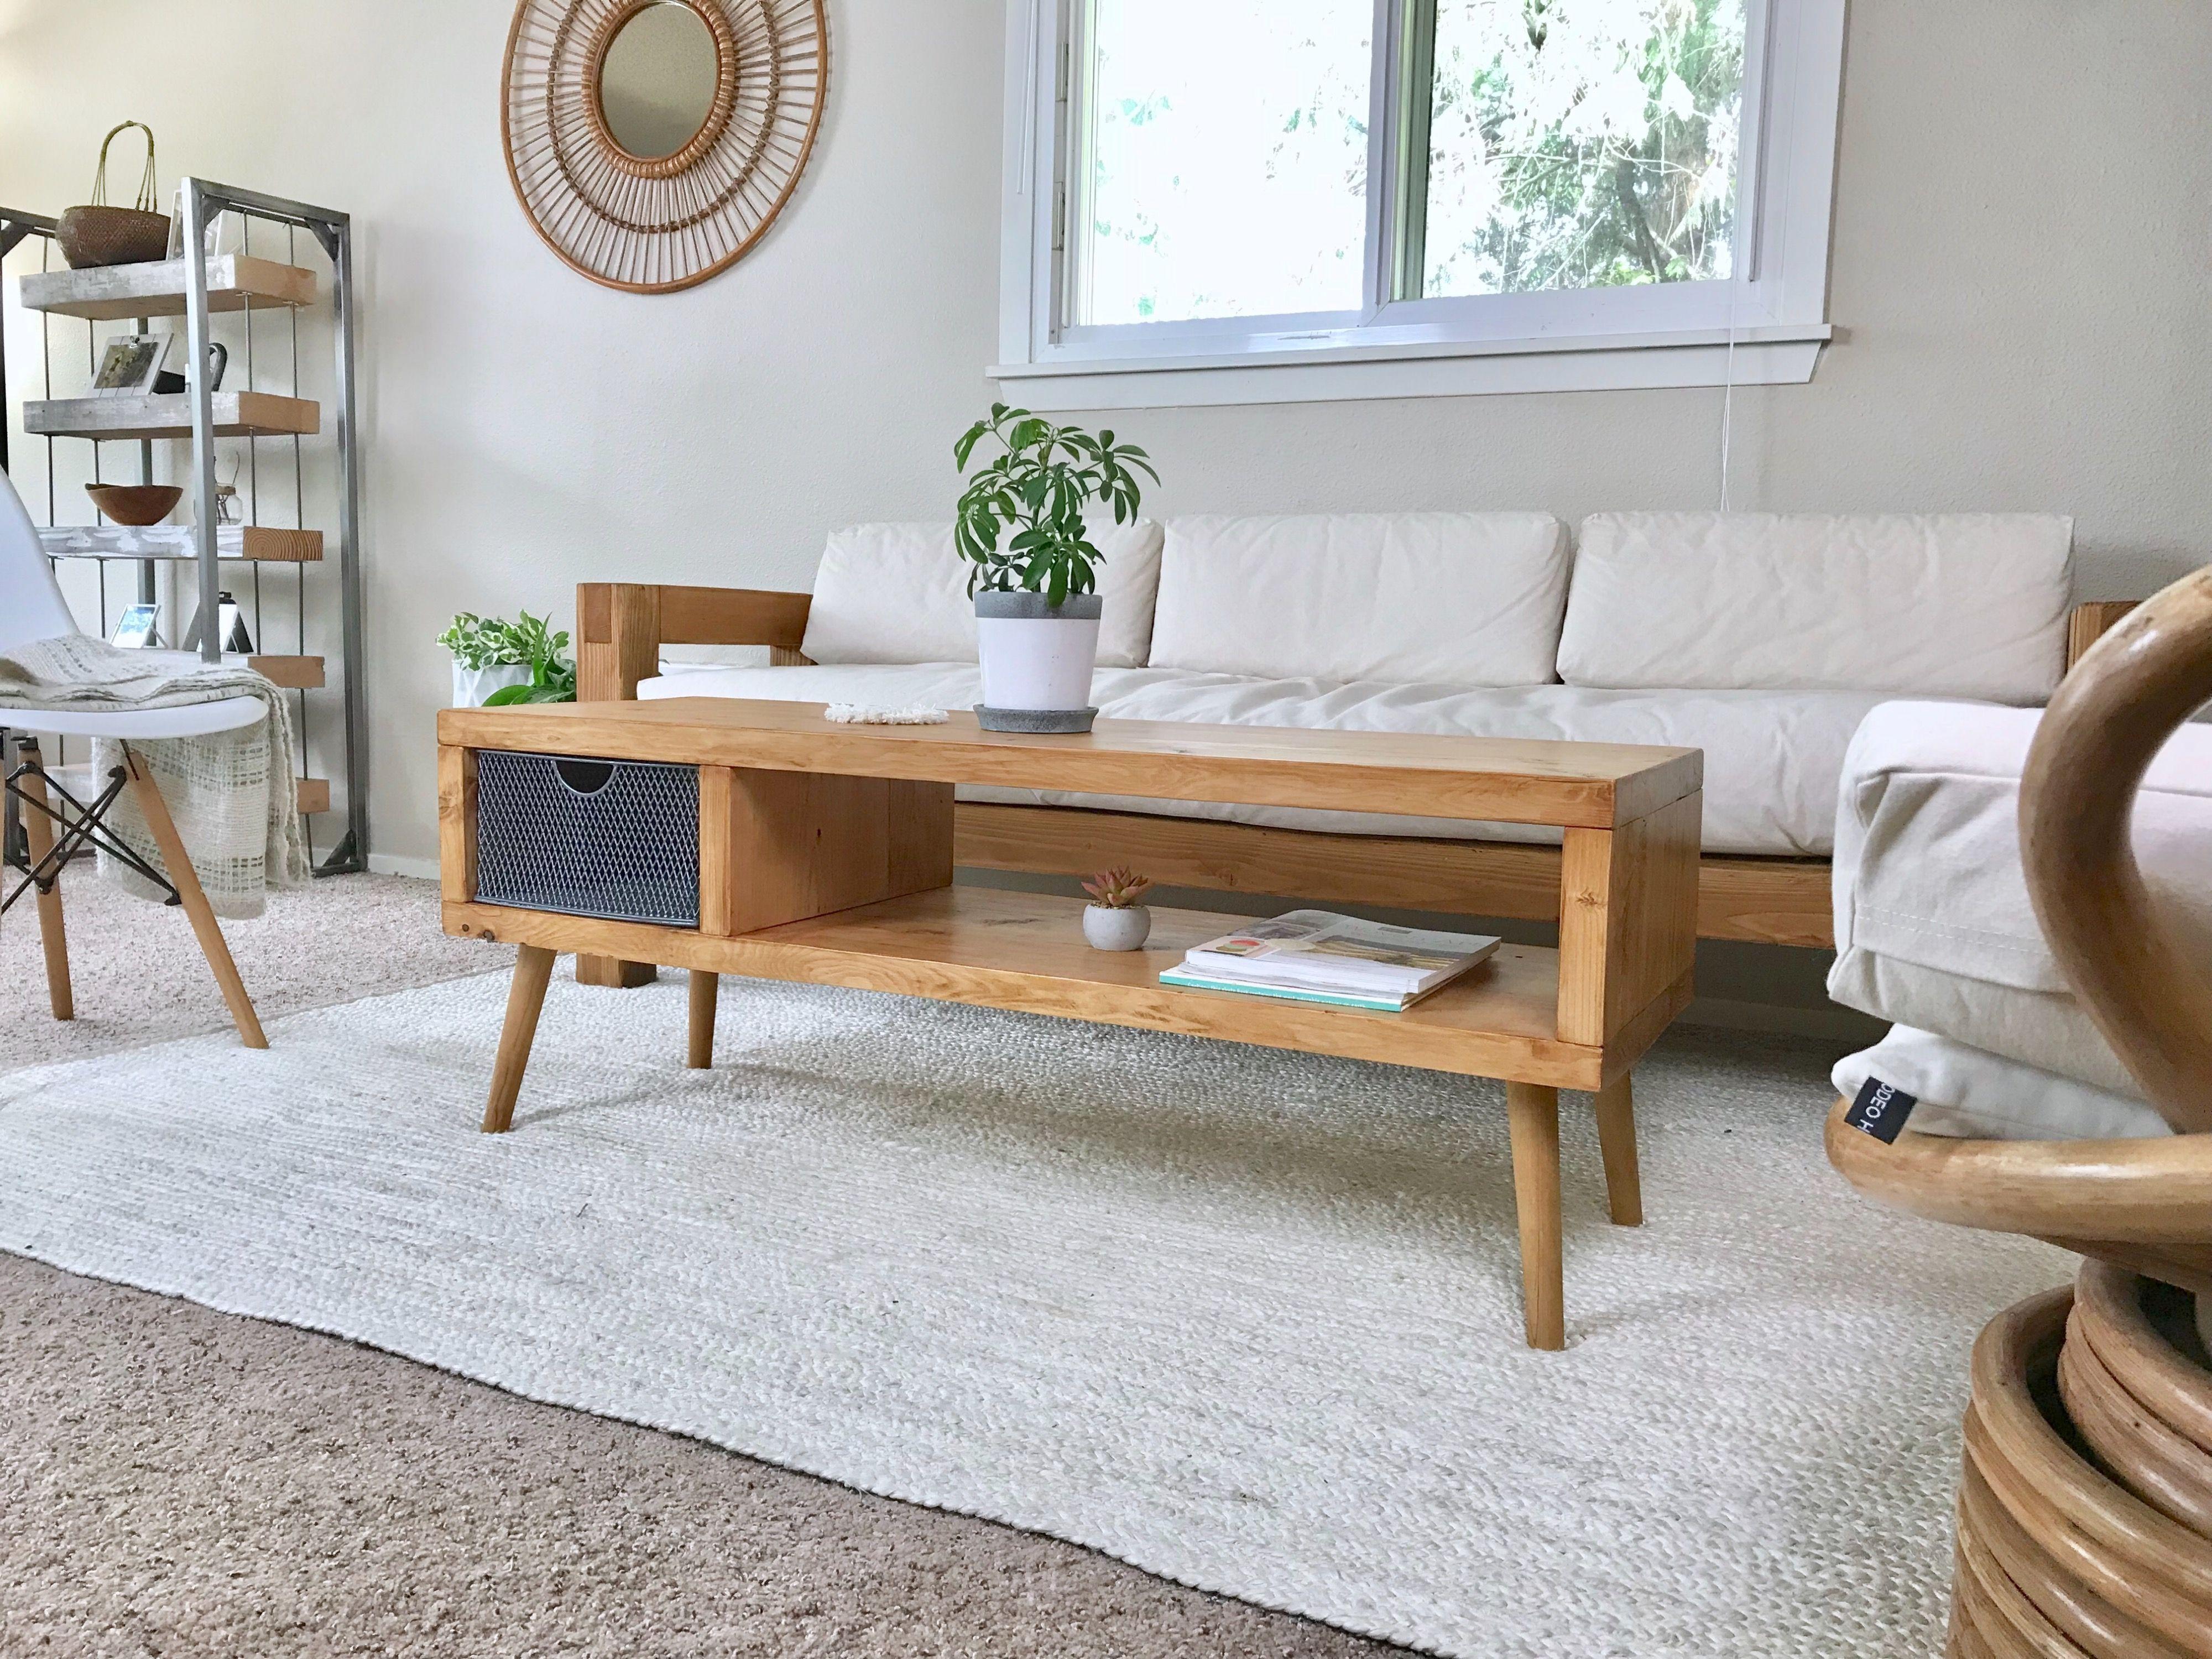 Stupendous Mid Century Modern Coffee Table With Storage An Ian Spiritservingveterans Wood Chair Design Ideas Spiritservingveteransorg